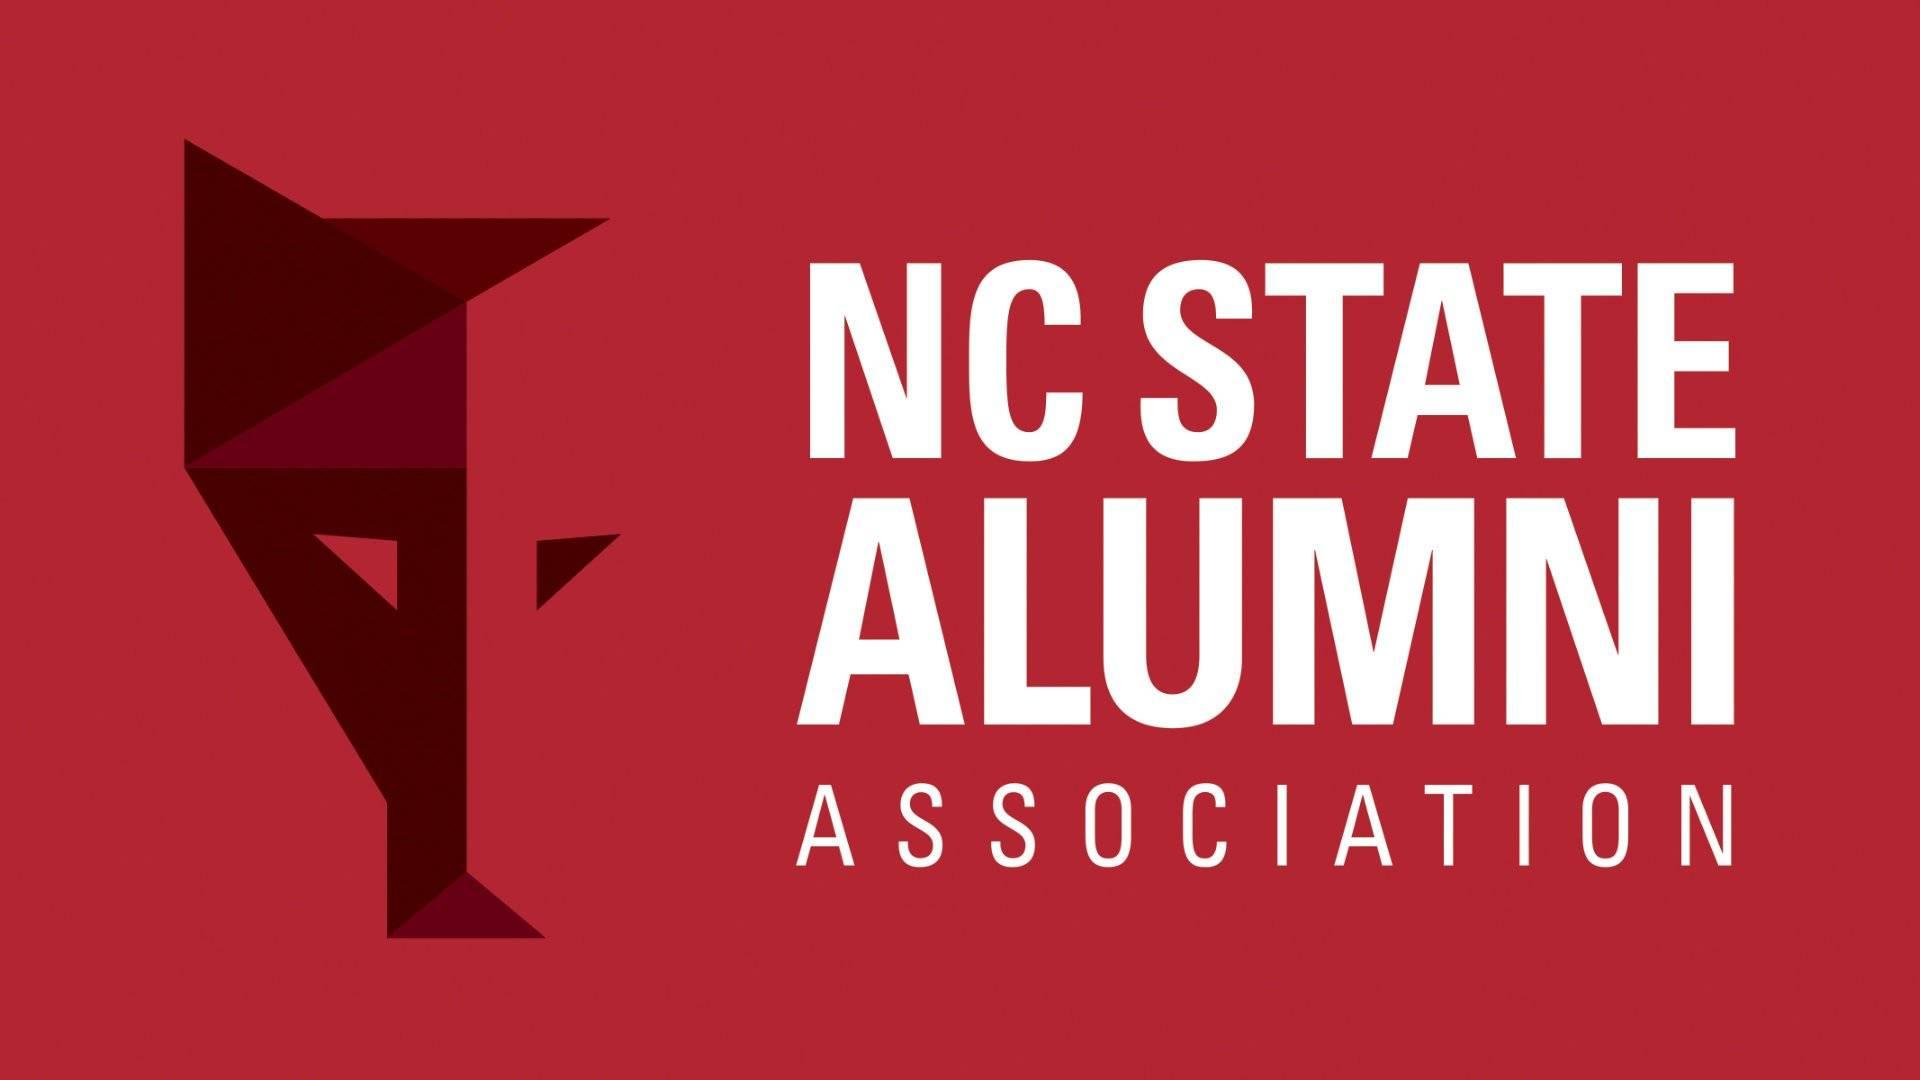 NCSU Alumni Association Case Study Placeholder Image